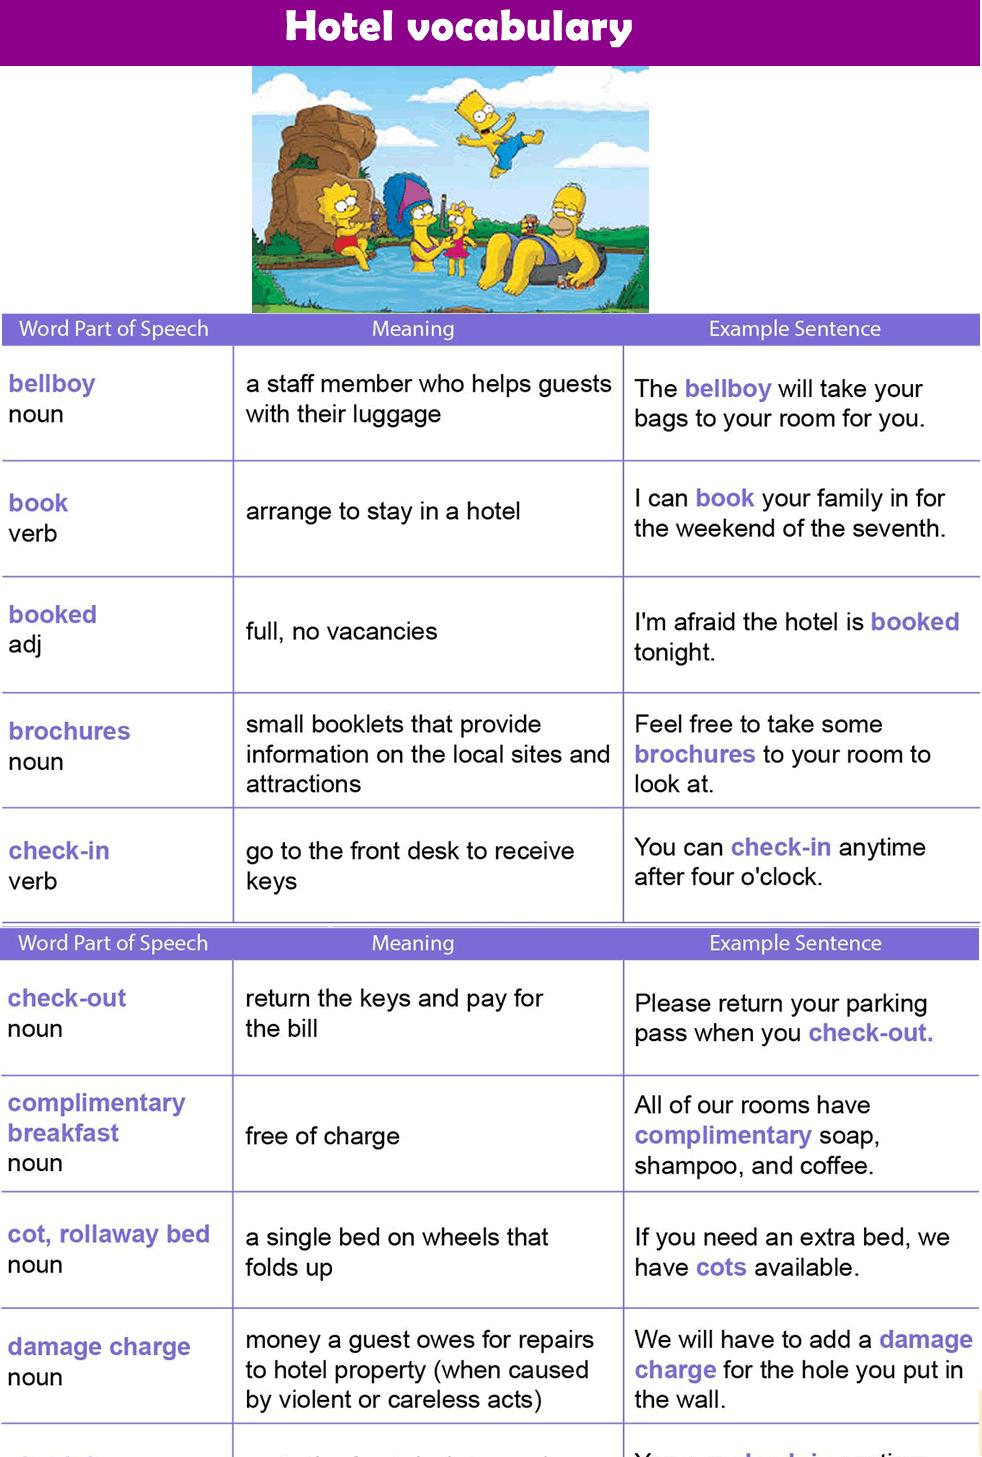 Hotel Vocabulary List With Pictures Pdf Vocabulario Ingles